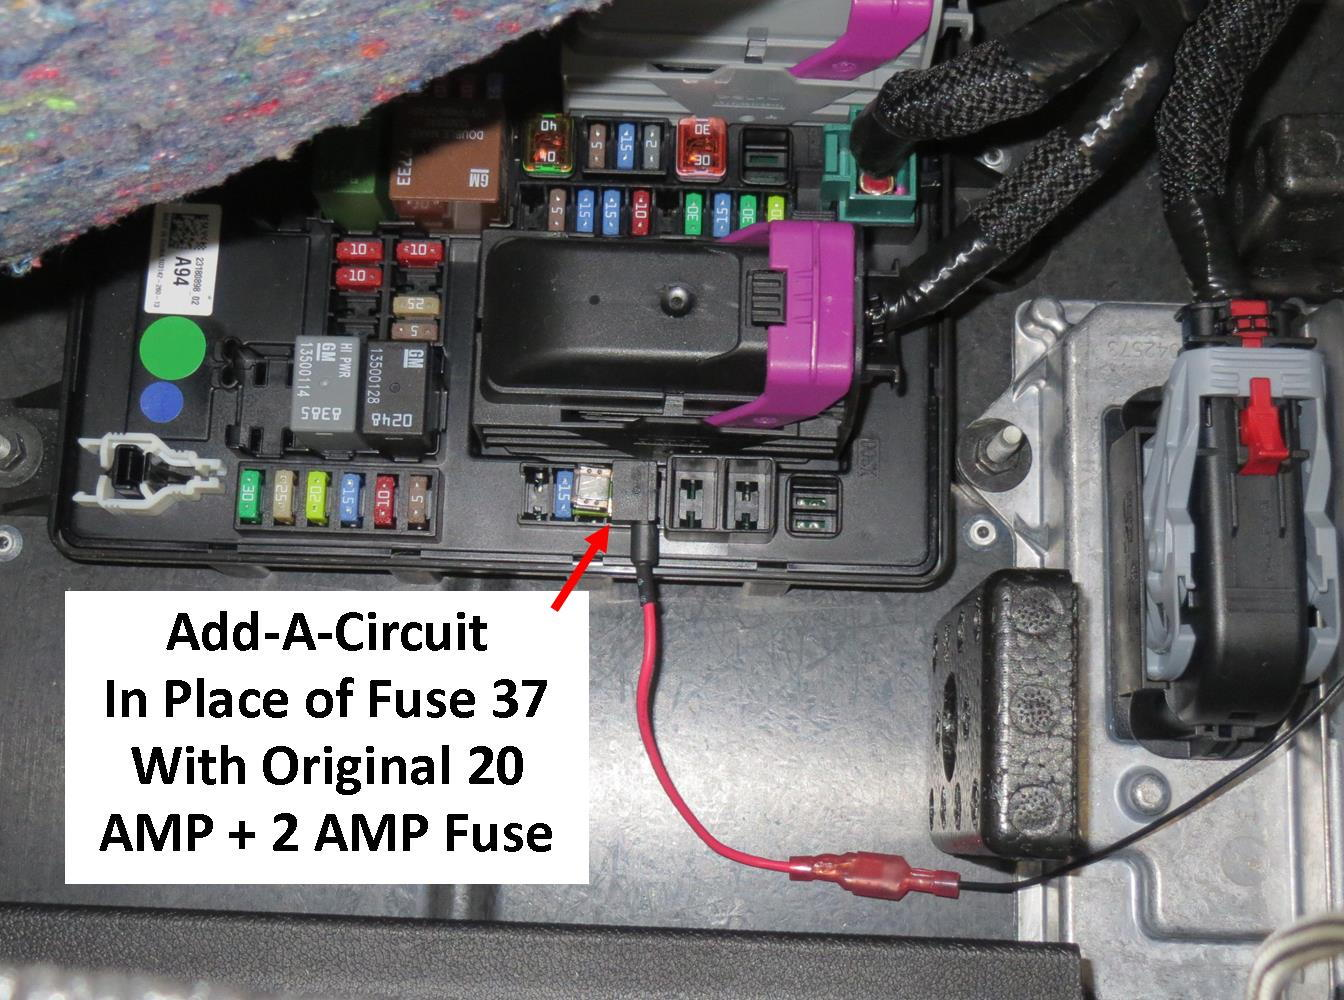 hight resolution of c7 corvette fuse box access wiring library jeep fuse box c7 corvette fuse box access